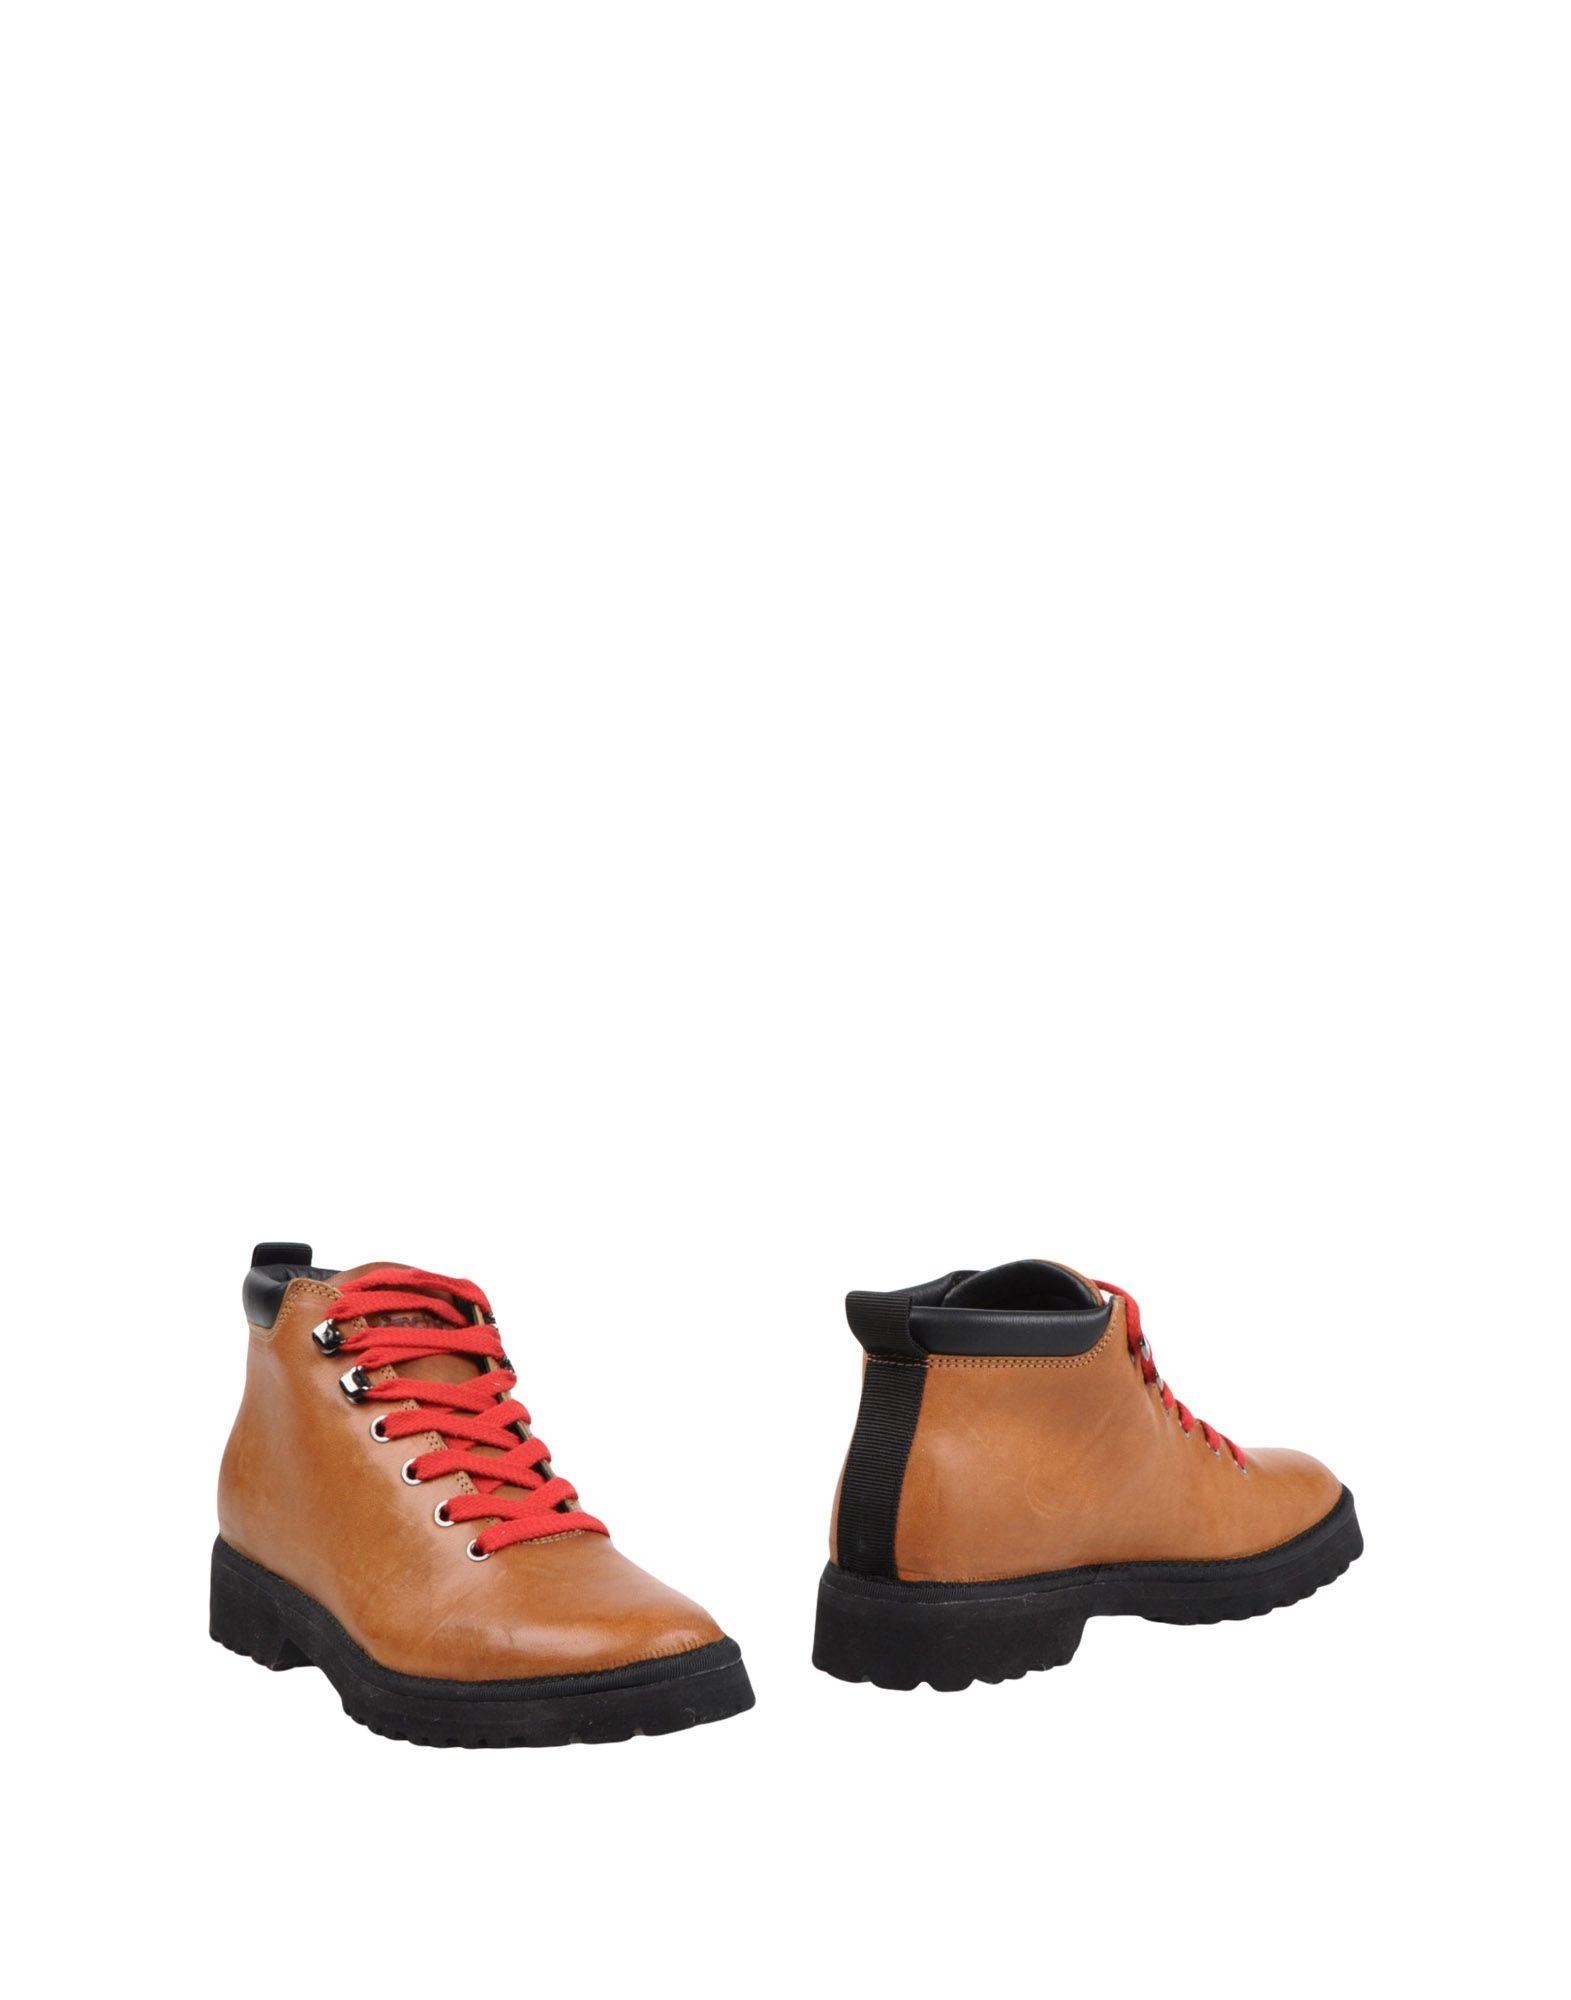 Pànchic Ankle Boot - Women Pànchic Ankle Australia Boots online on  Australia Ankle - 11242581ST 9b7c83